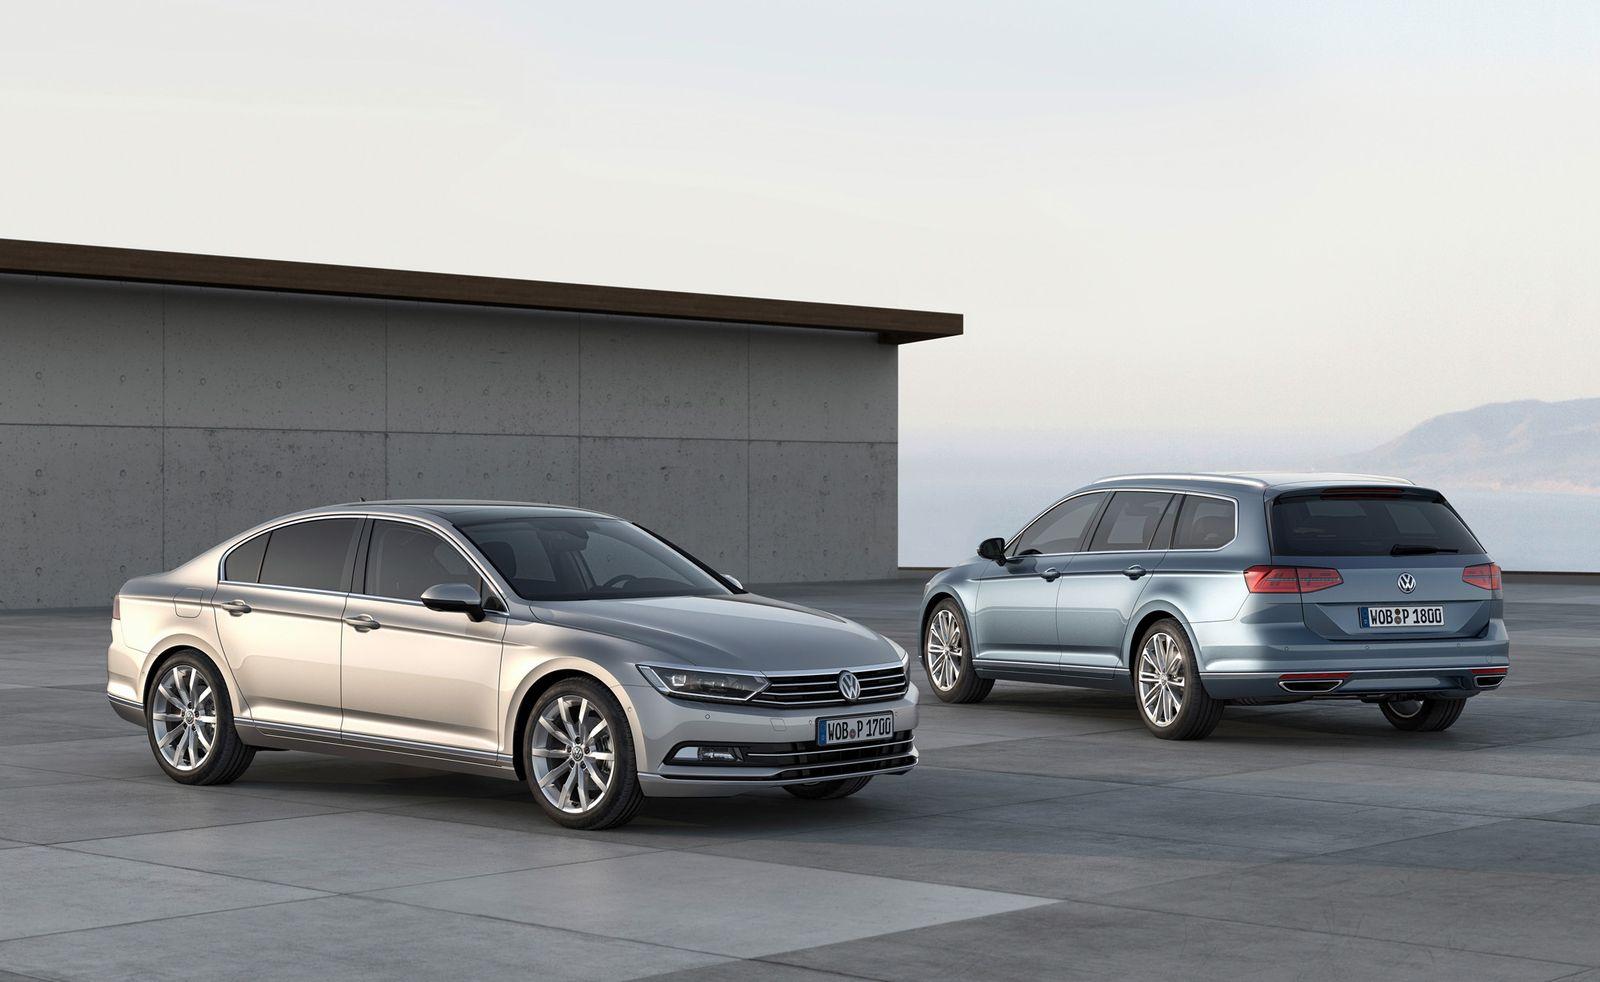 2014 / VW Passat / VW Passat Variant (Kopie)